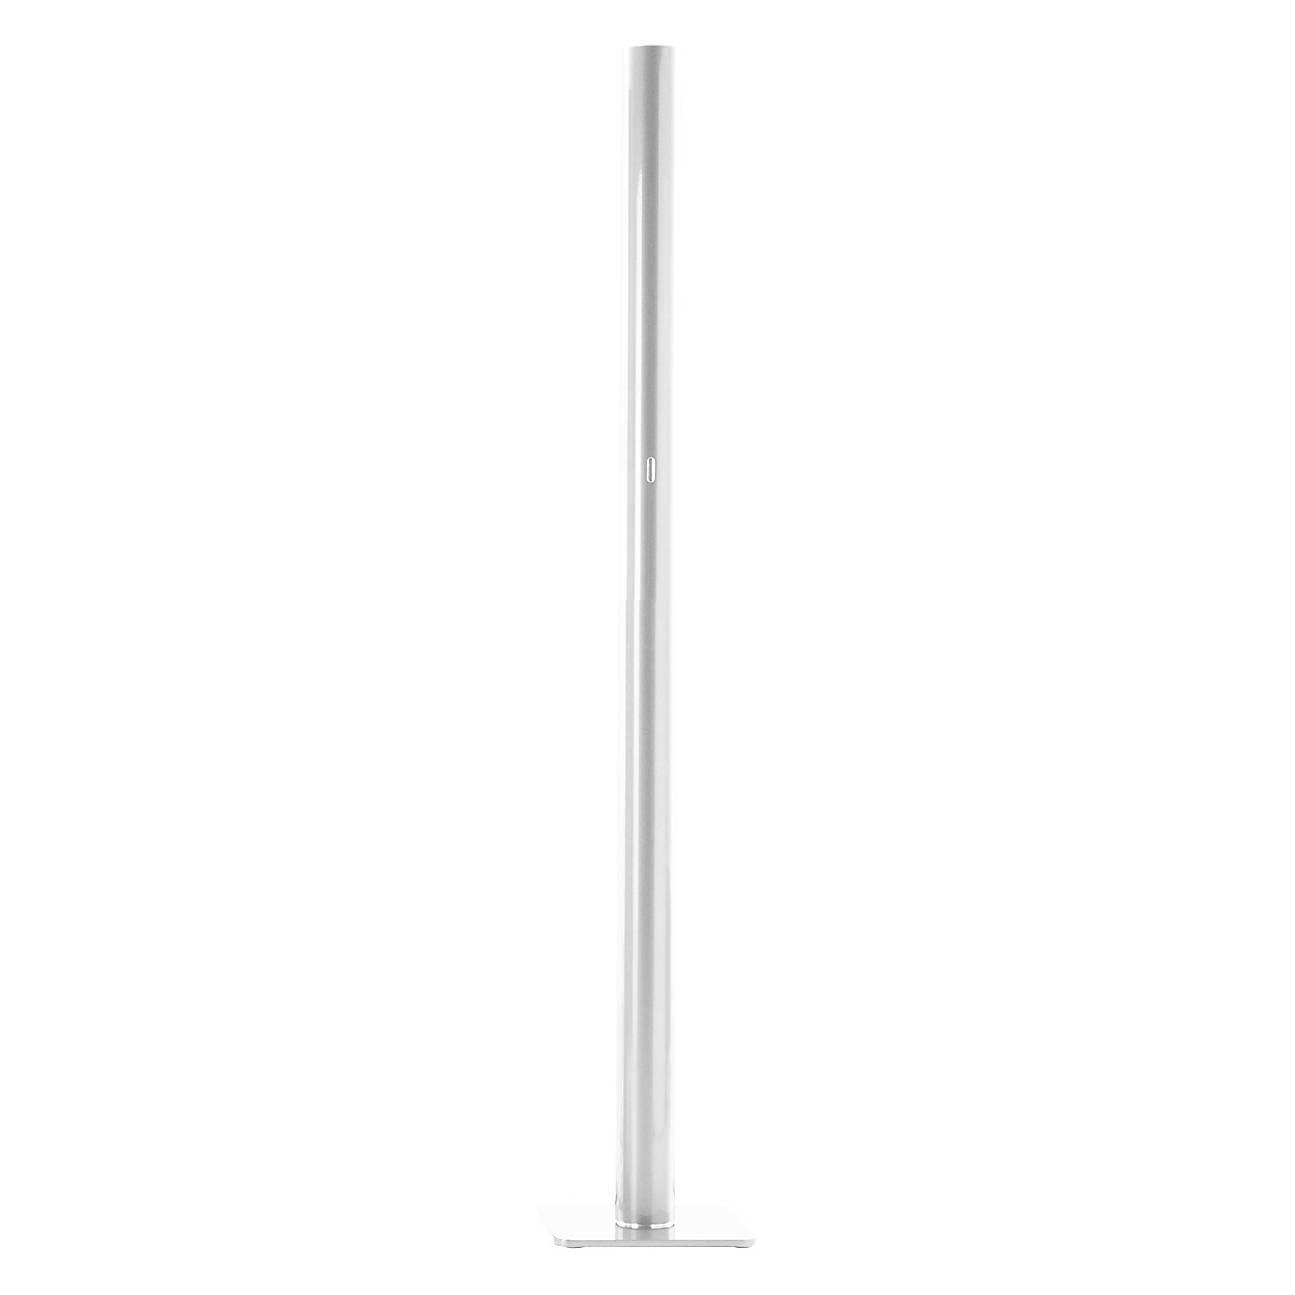 white ilio floor lamp by ernesto gismondi for artemide italy